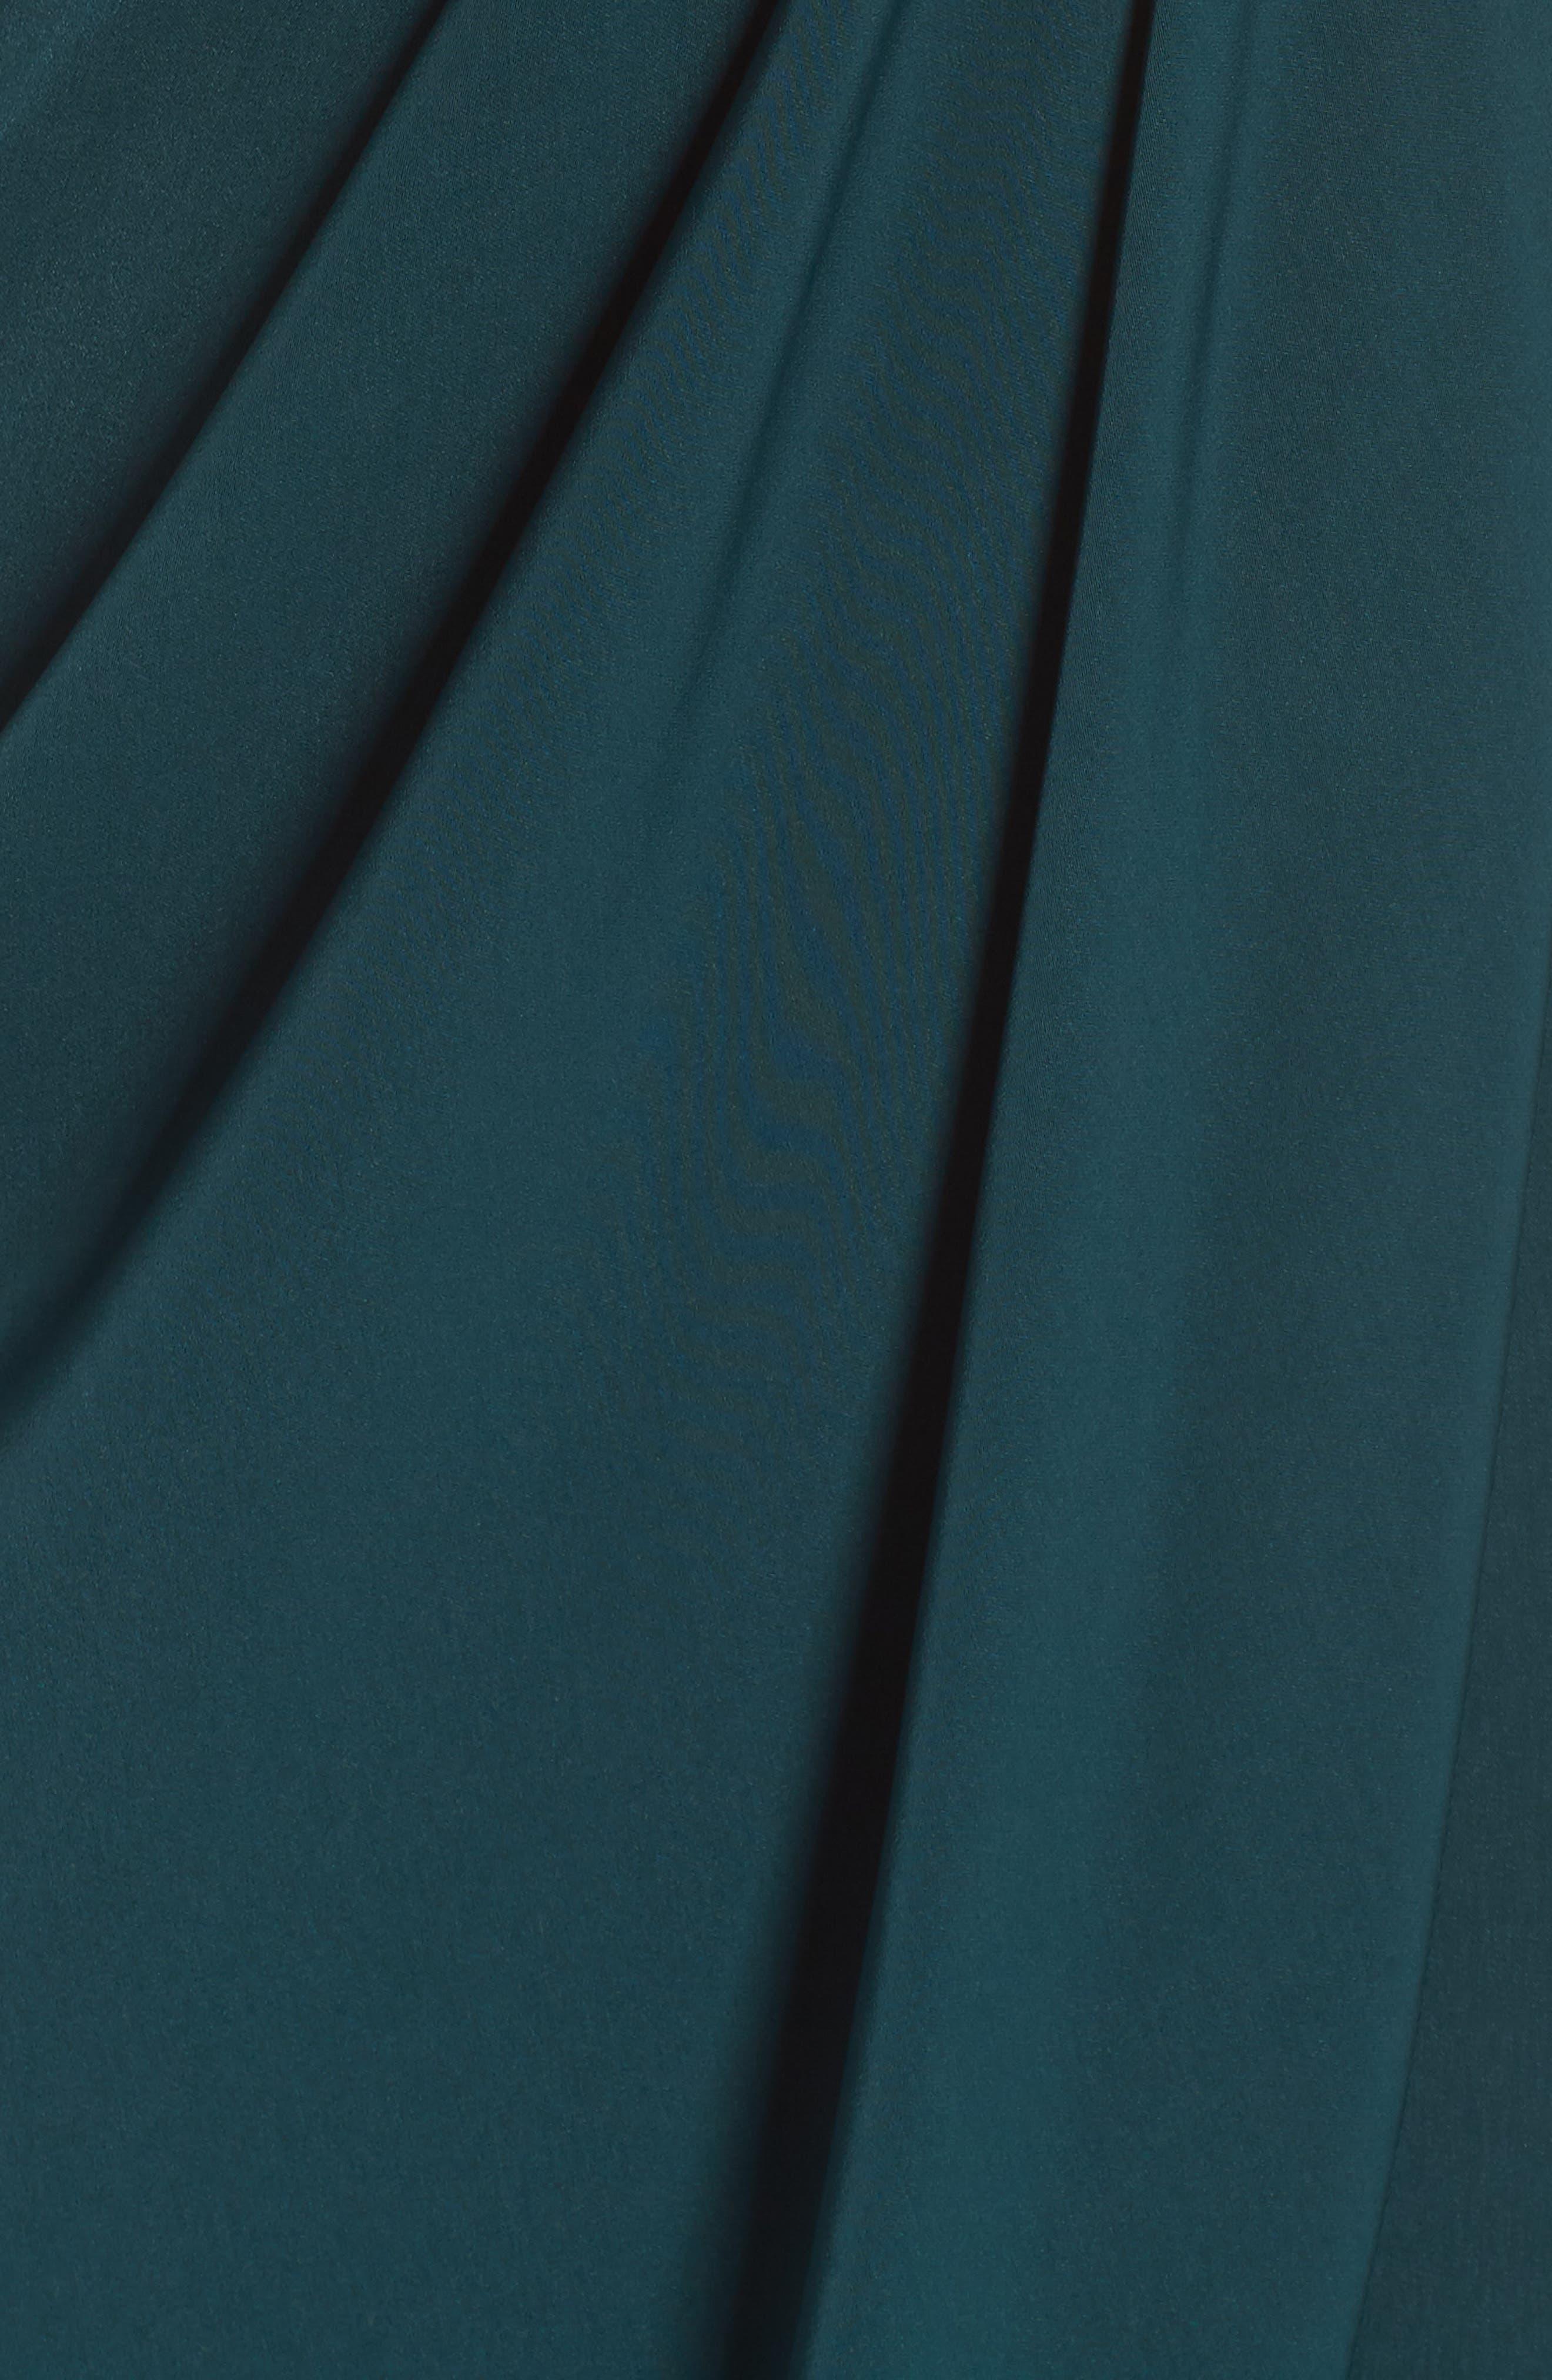 Tulip Hem Maxi Dress,                             Alternate thumbnail 6, color,                             SEAWEED